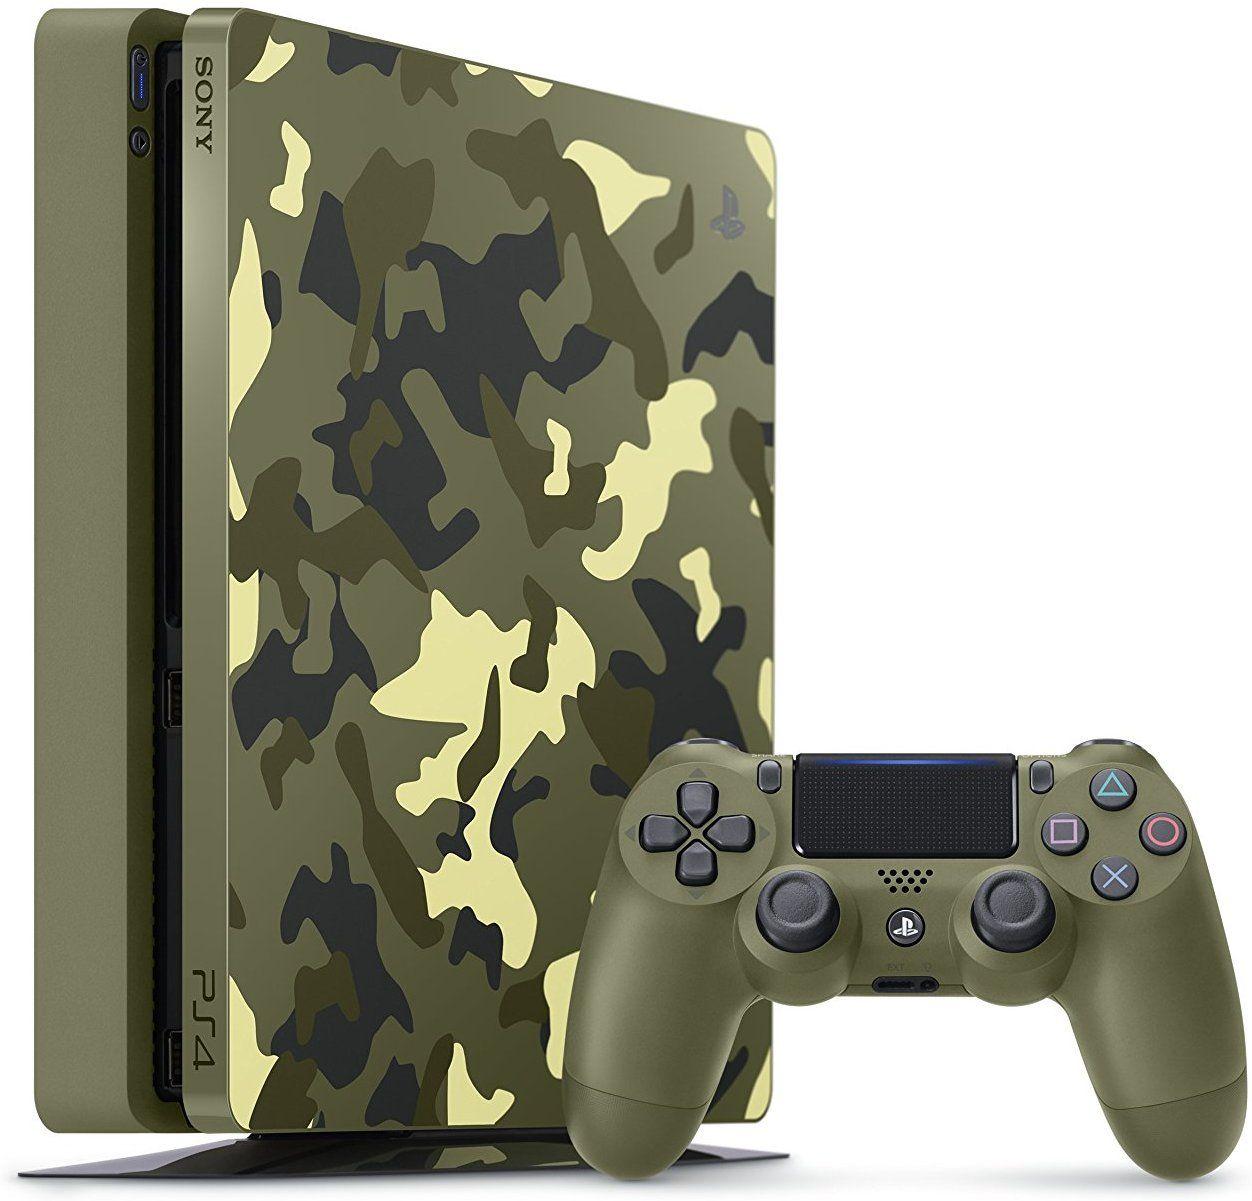 PlayStation 4 Slim 1TB Limited Edition Console